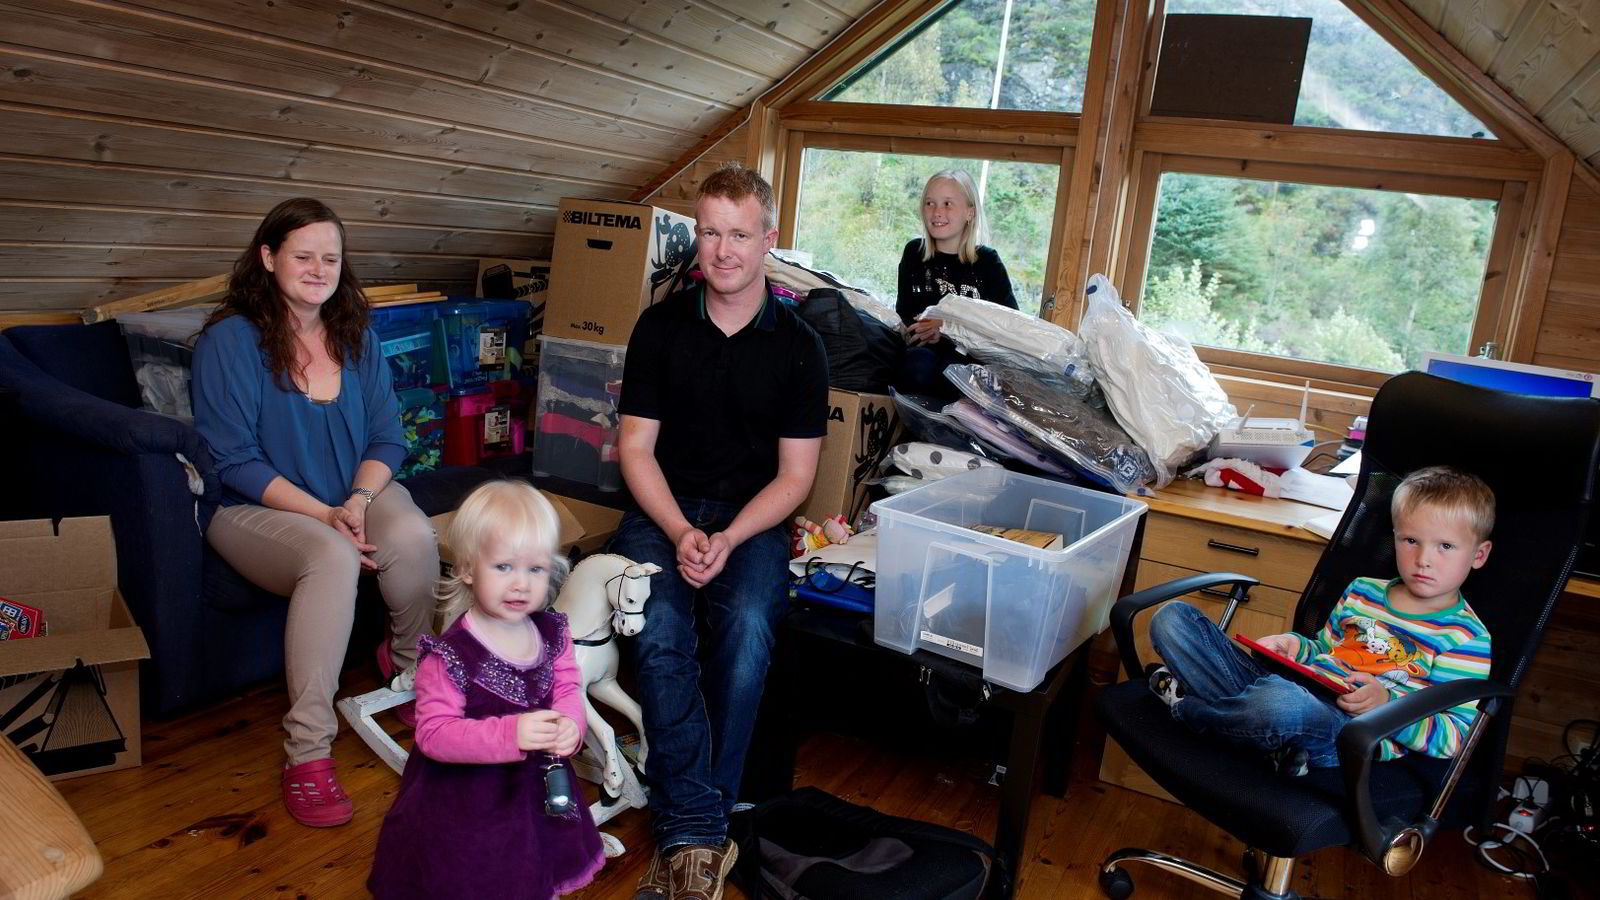 Jakob Nielsen med kona Marianne og barna Victoria Linnea (1), Amalie Beate (13) og Theodor Mikael (5) midt i flyttekaoset. Foto: